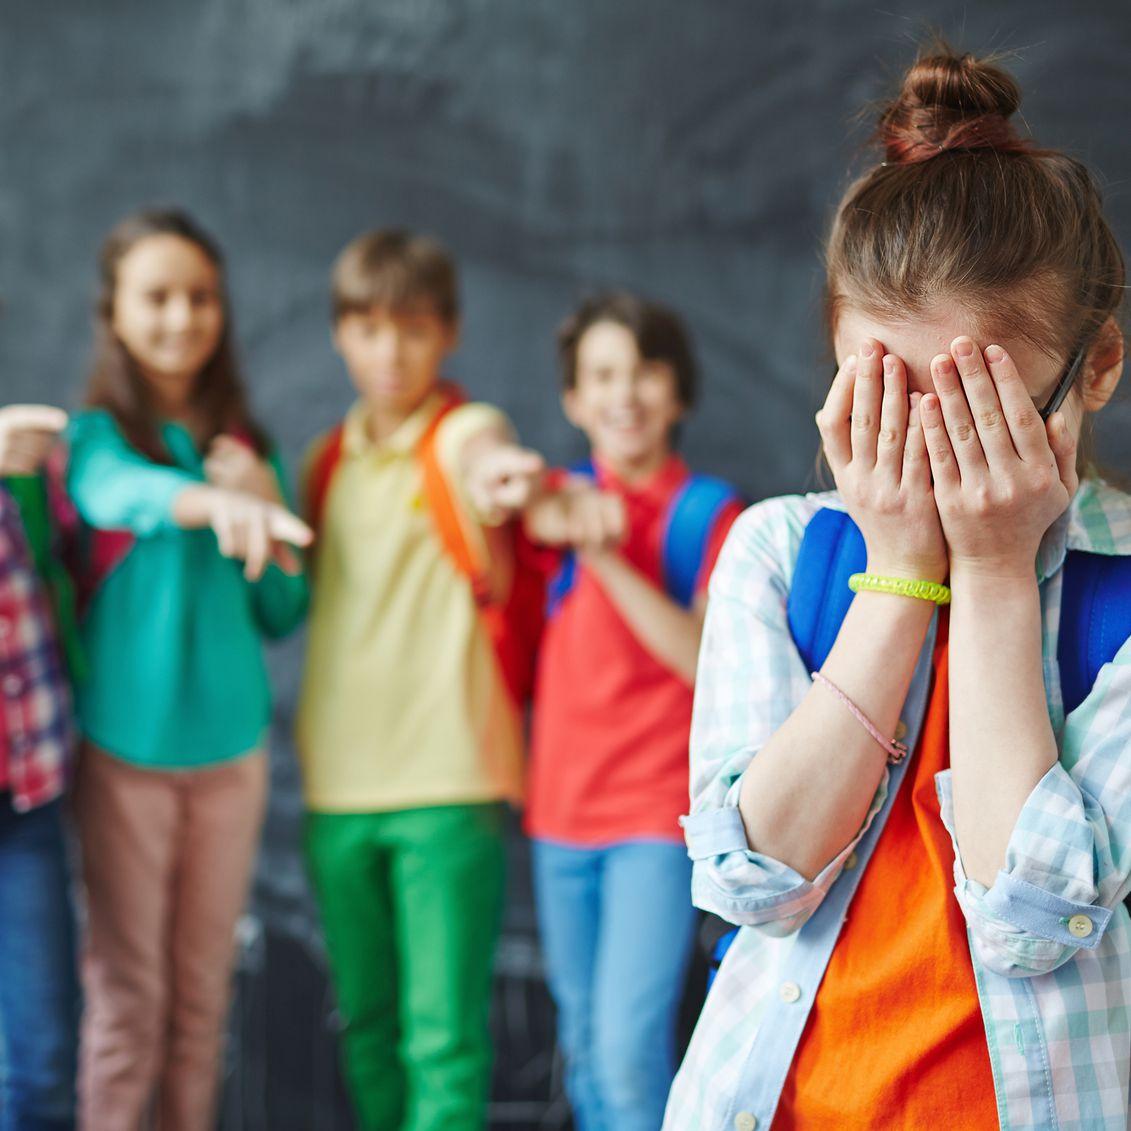 How Peer Pressure Leads to Bullying